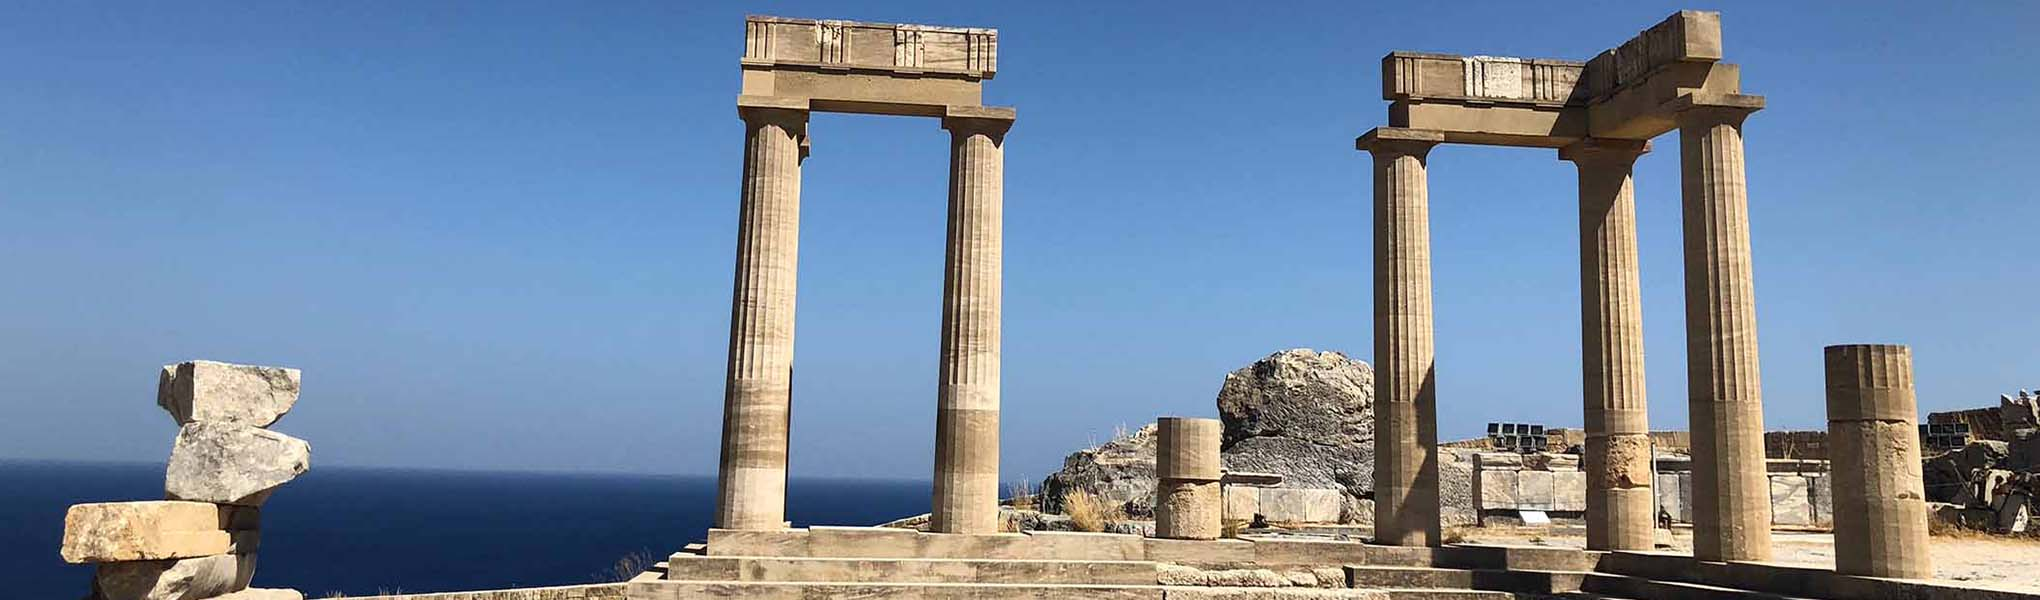 Destination Rhodes Discover Hotels in Rhodes TicketSeller Προορισμός Ρόδος Ανακαλύψτε ξενοδοχεία στην Ρόδος